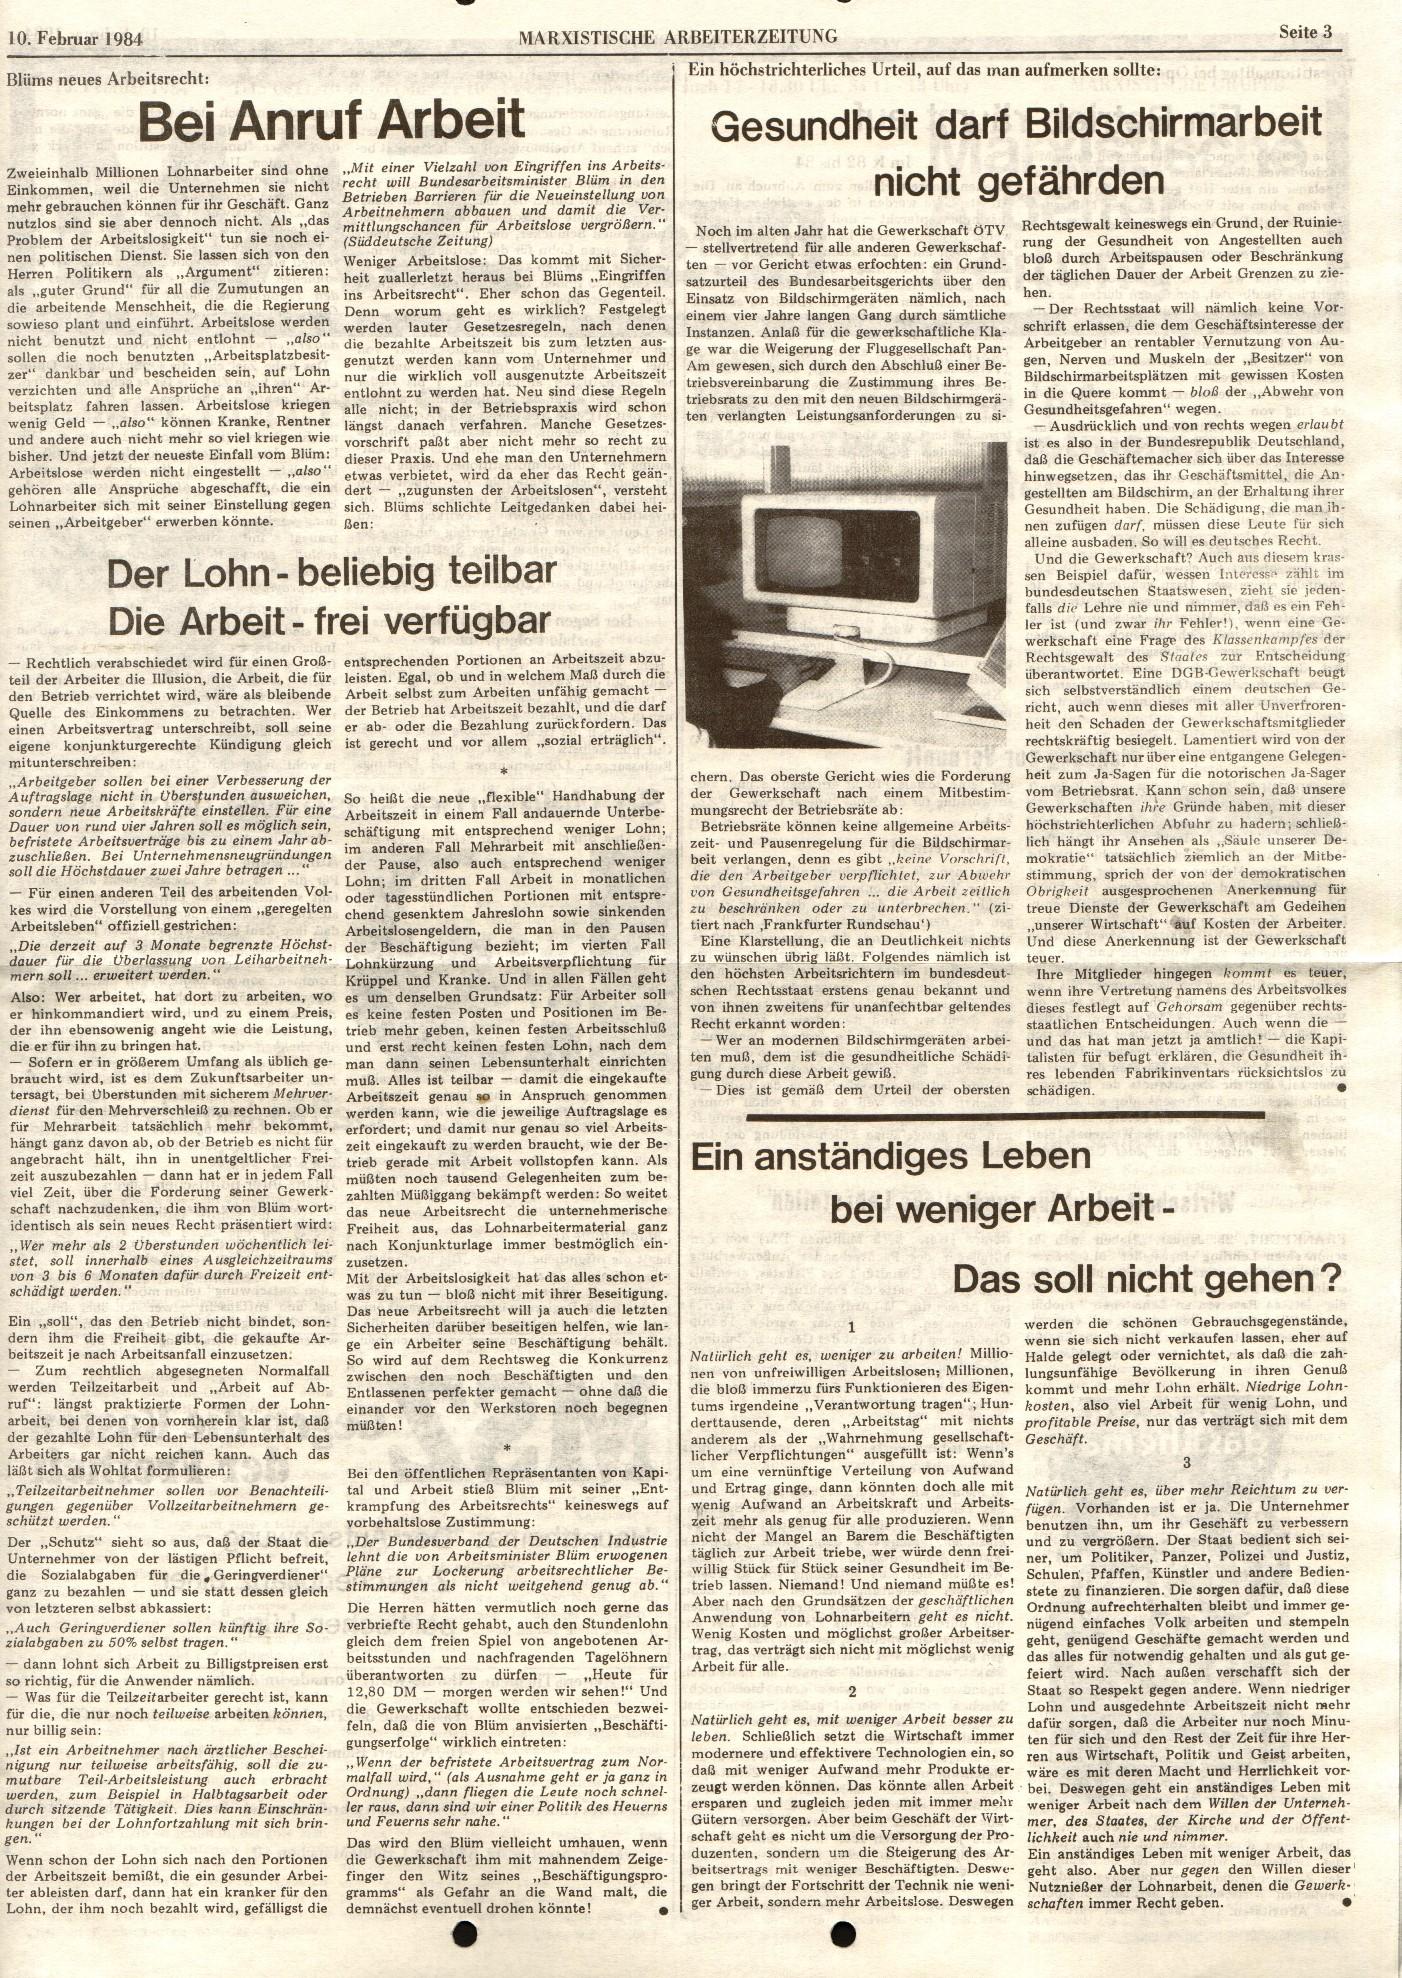 Ruesselsheim_MG_Marxistische_Arbeiterzeitung_Opel_19840210_03